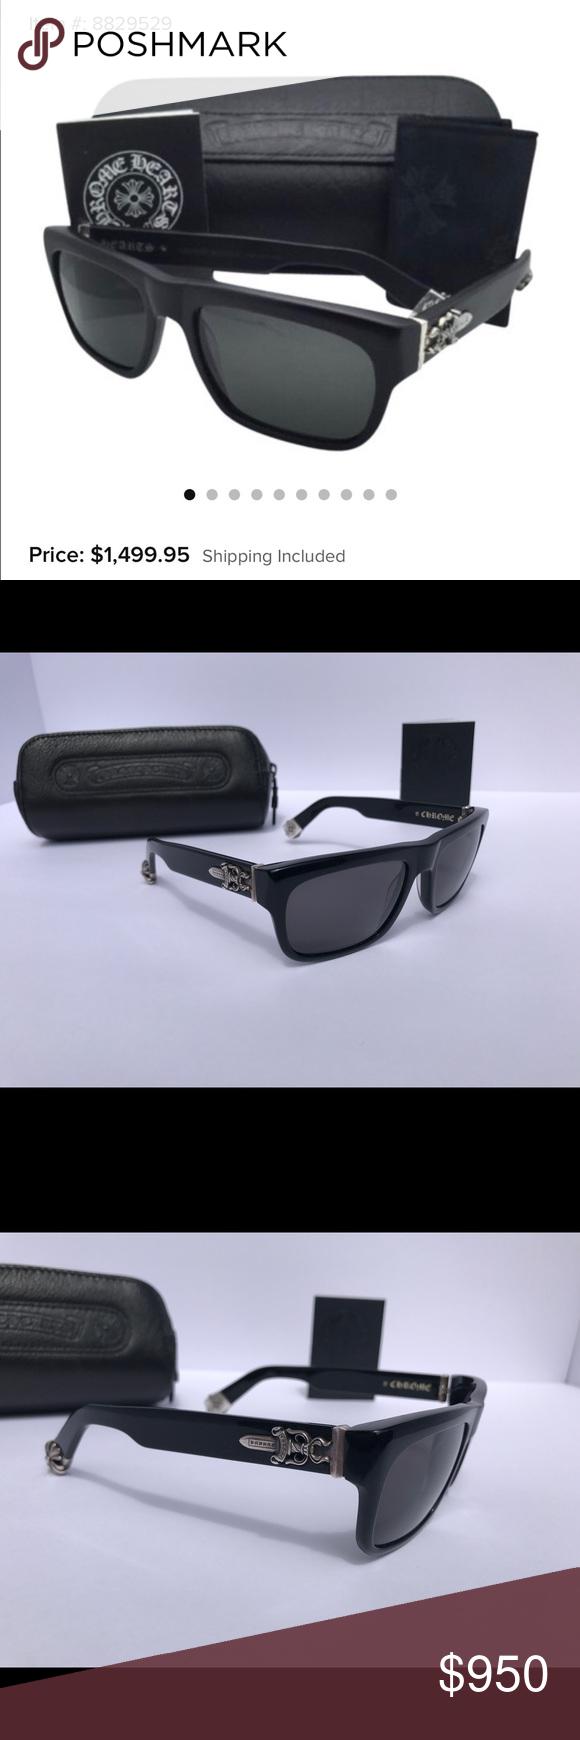 21eaaf0f1db5 LIKE NEW Chrome Hearts Sluss Bussin sunglasses I m selling my Chrome Hearts  Sluss Bussin